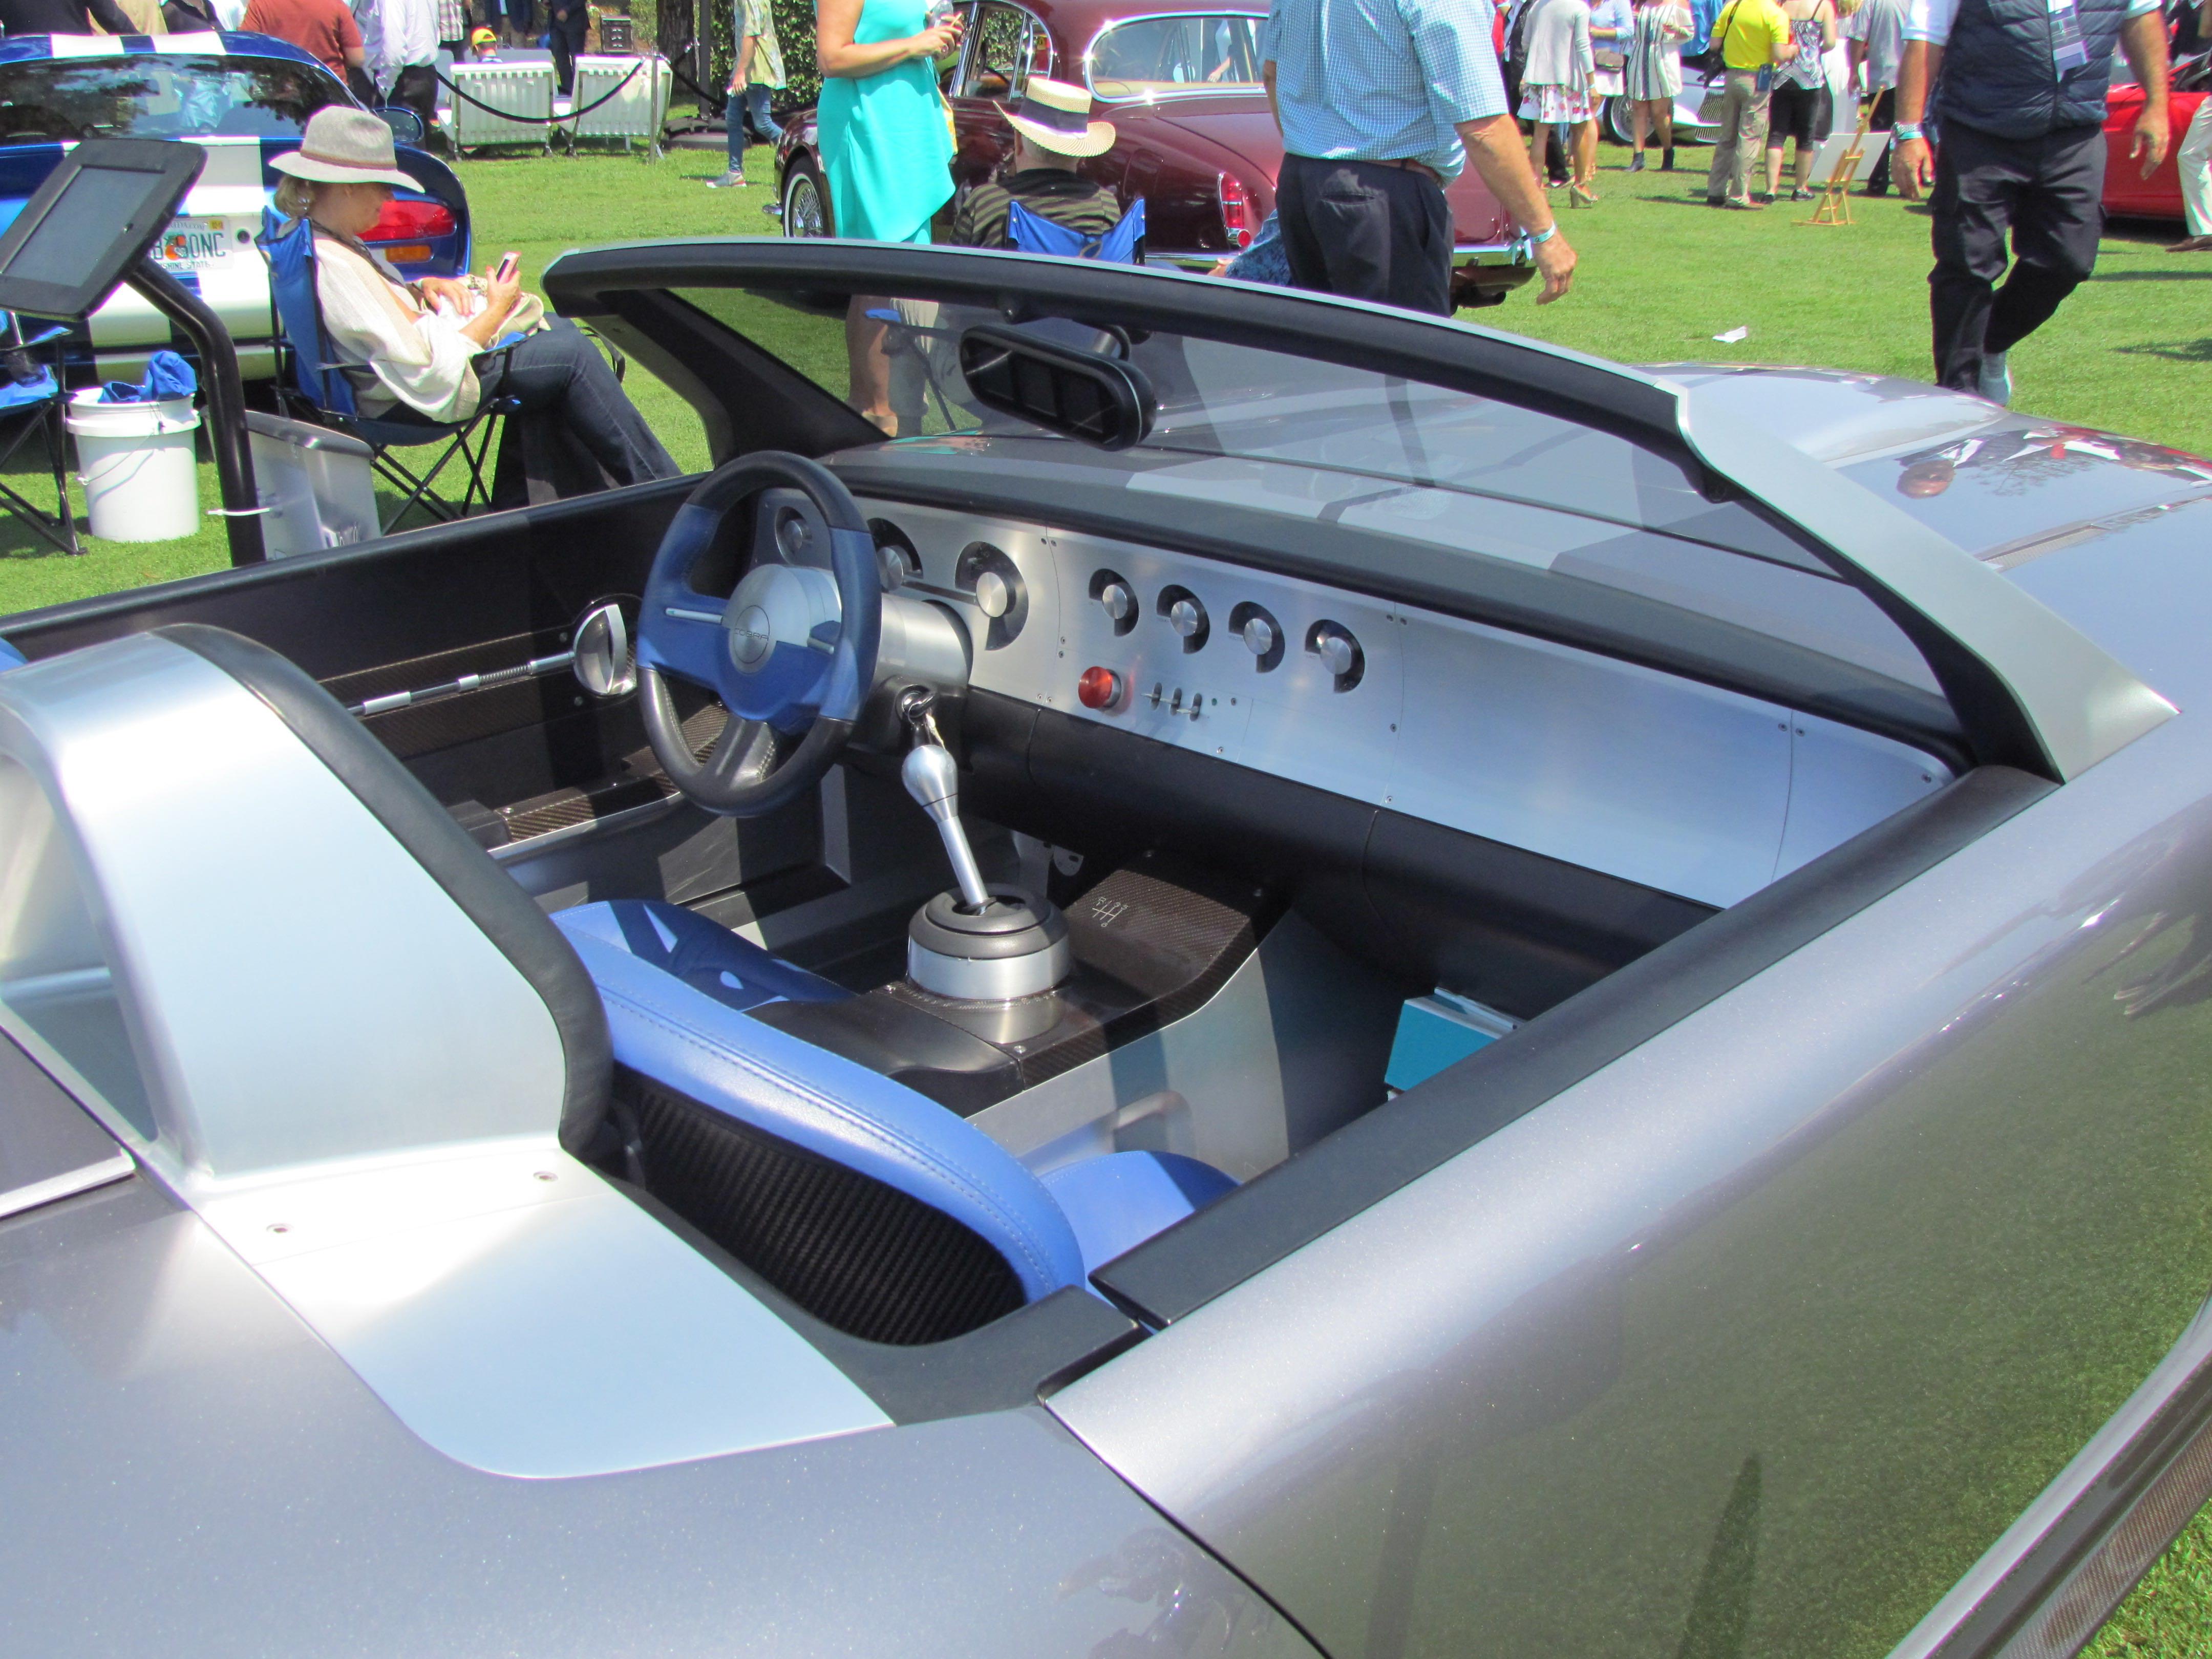 , V10-powered Ford Shelby Cobra concept up for bidding in November, ClassicCars.com Journal